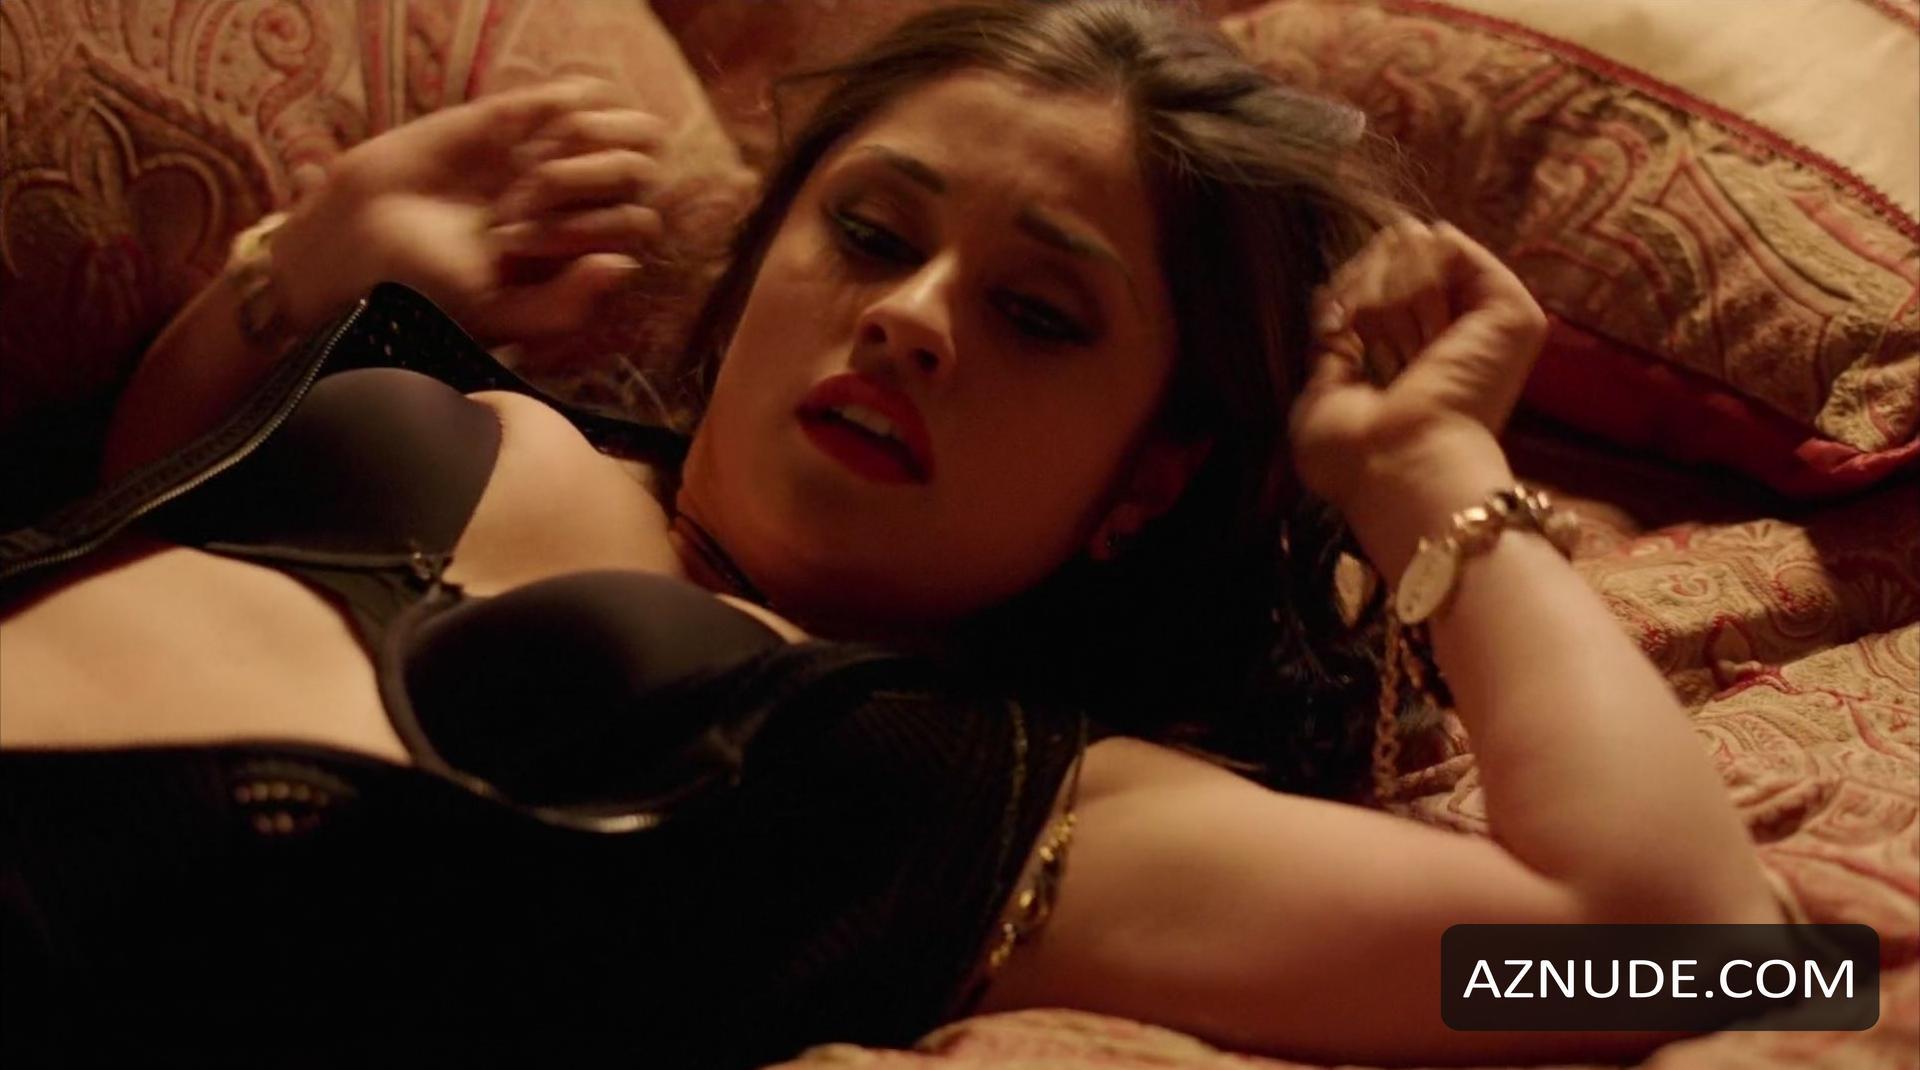 Shania twain sex tape part 2 - 2 part 9